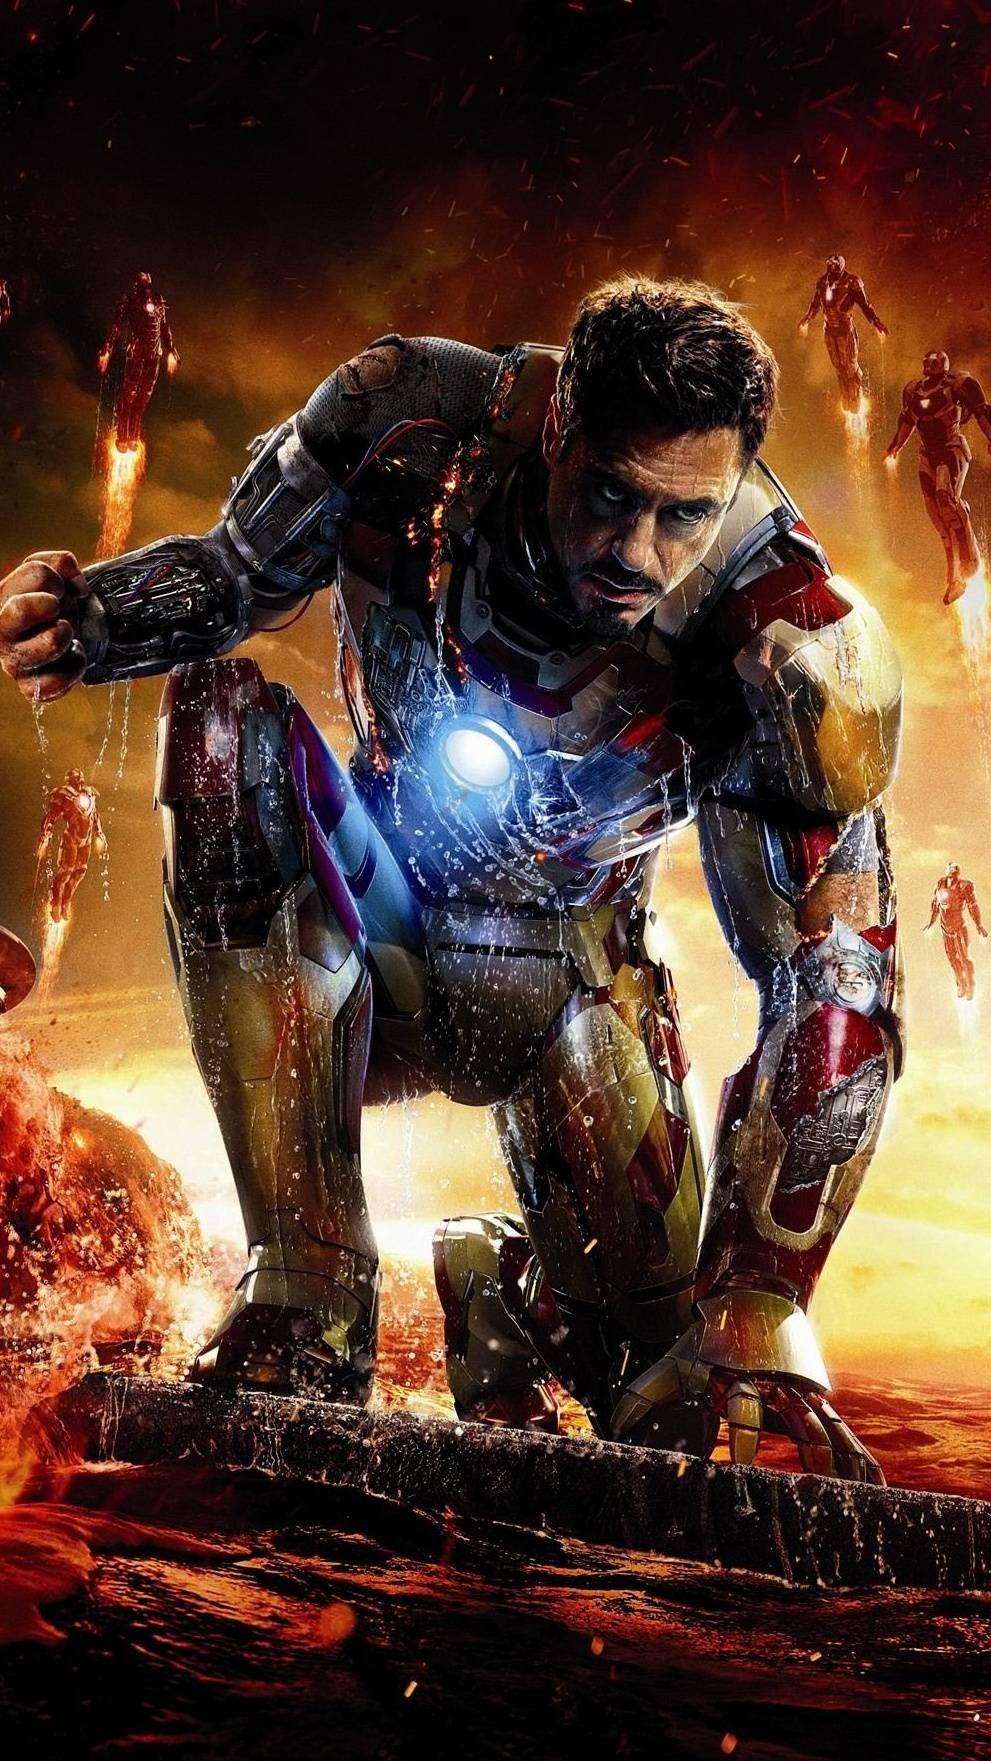 Download marval Iron man 3 in hindi & english in HD